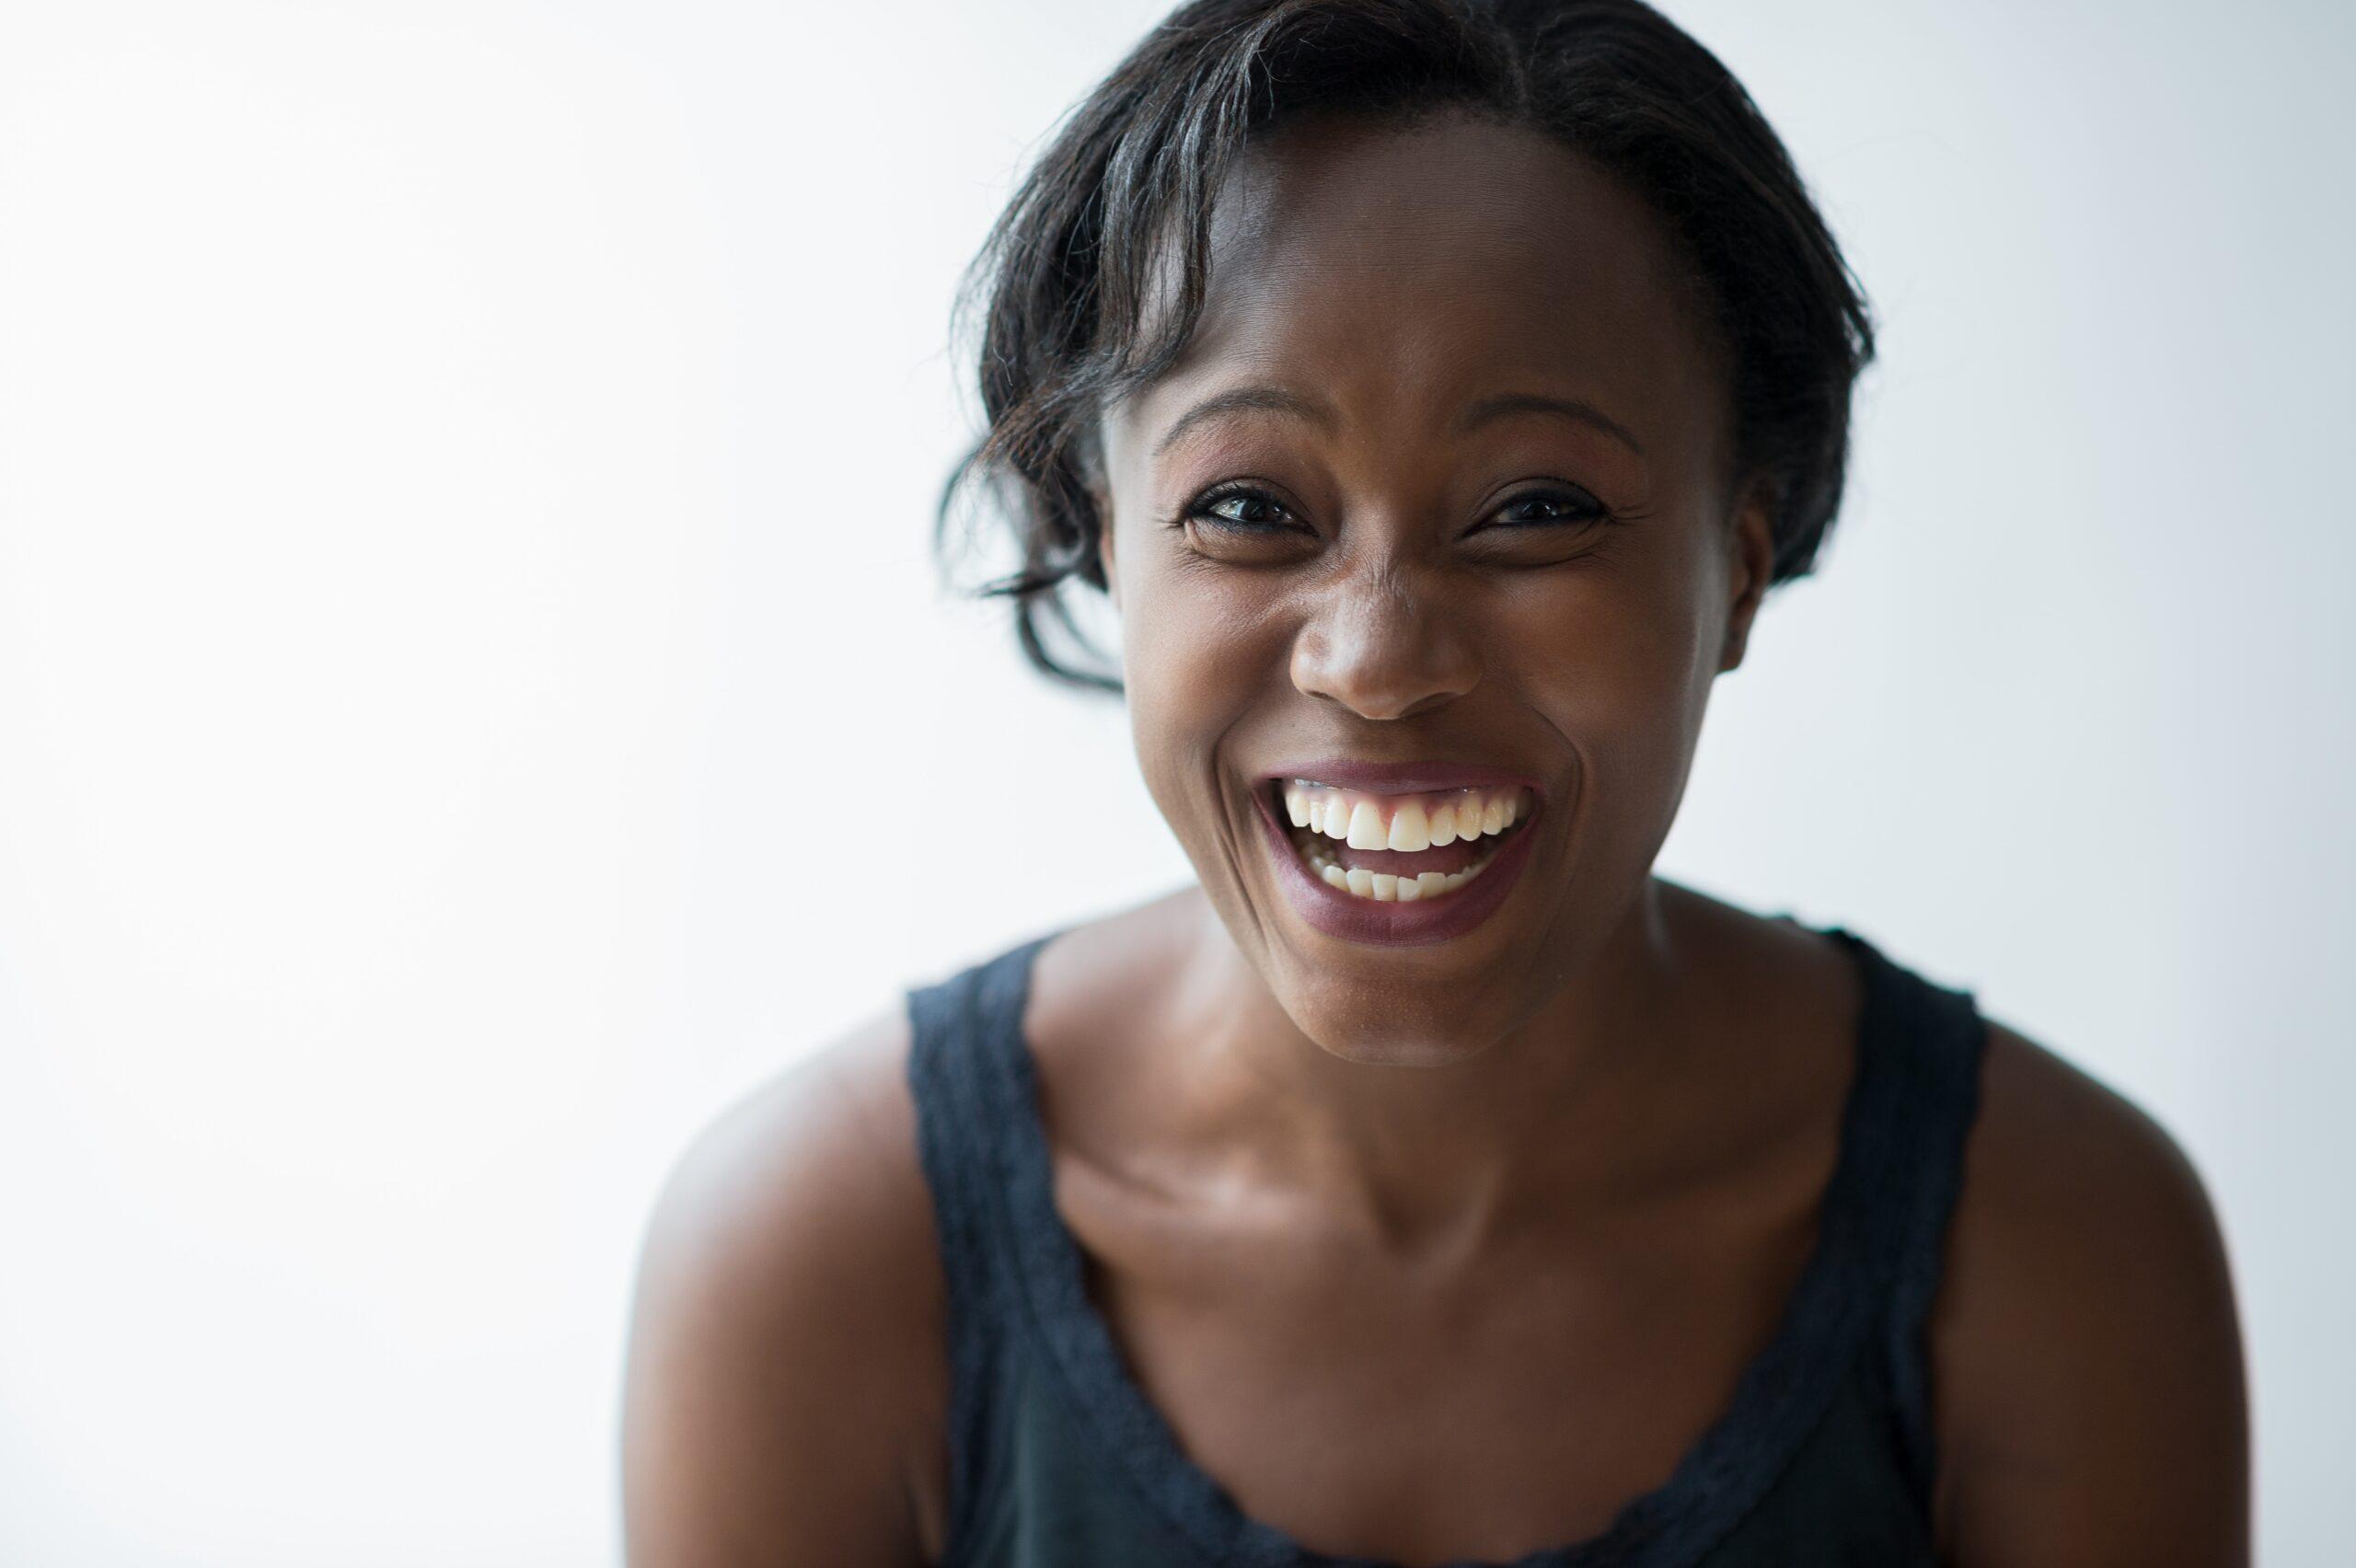 We Love Making You Smile | Dentist in 68786